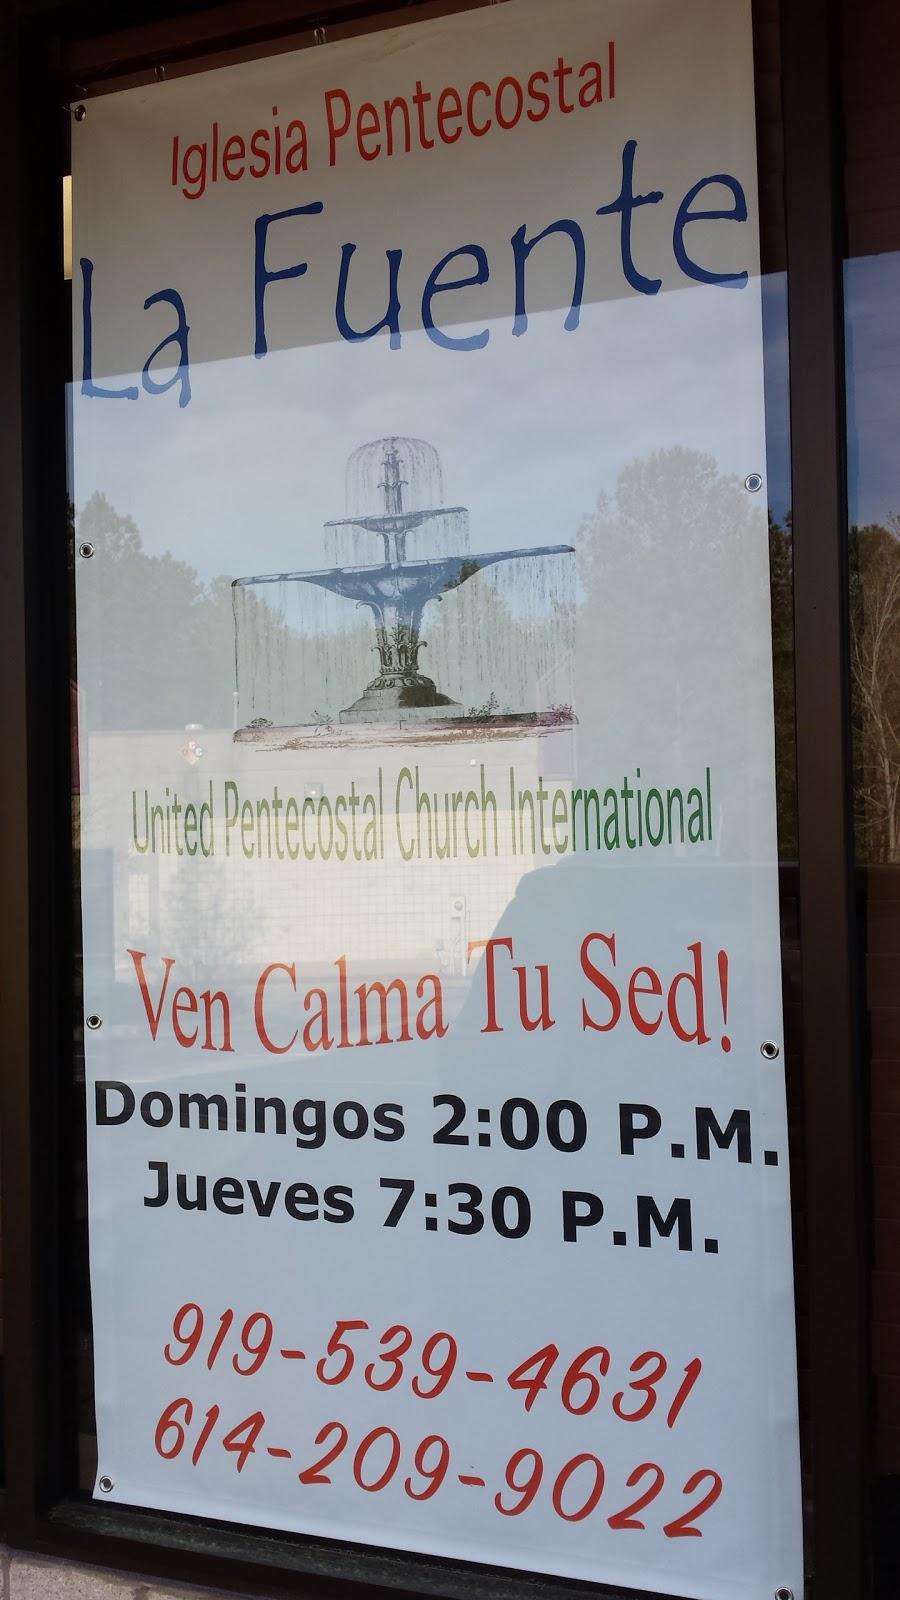 Church of La Fuente - church  | Photo 1 of 1 | Address: 240 Newton Rd, Raleigh, NC 27615, USA | Phone: (919) 539-4631